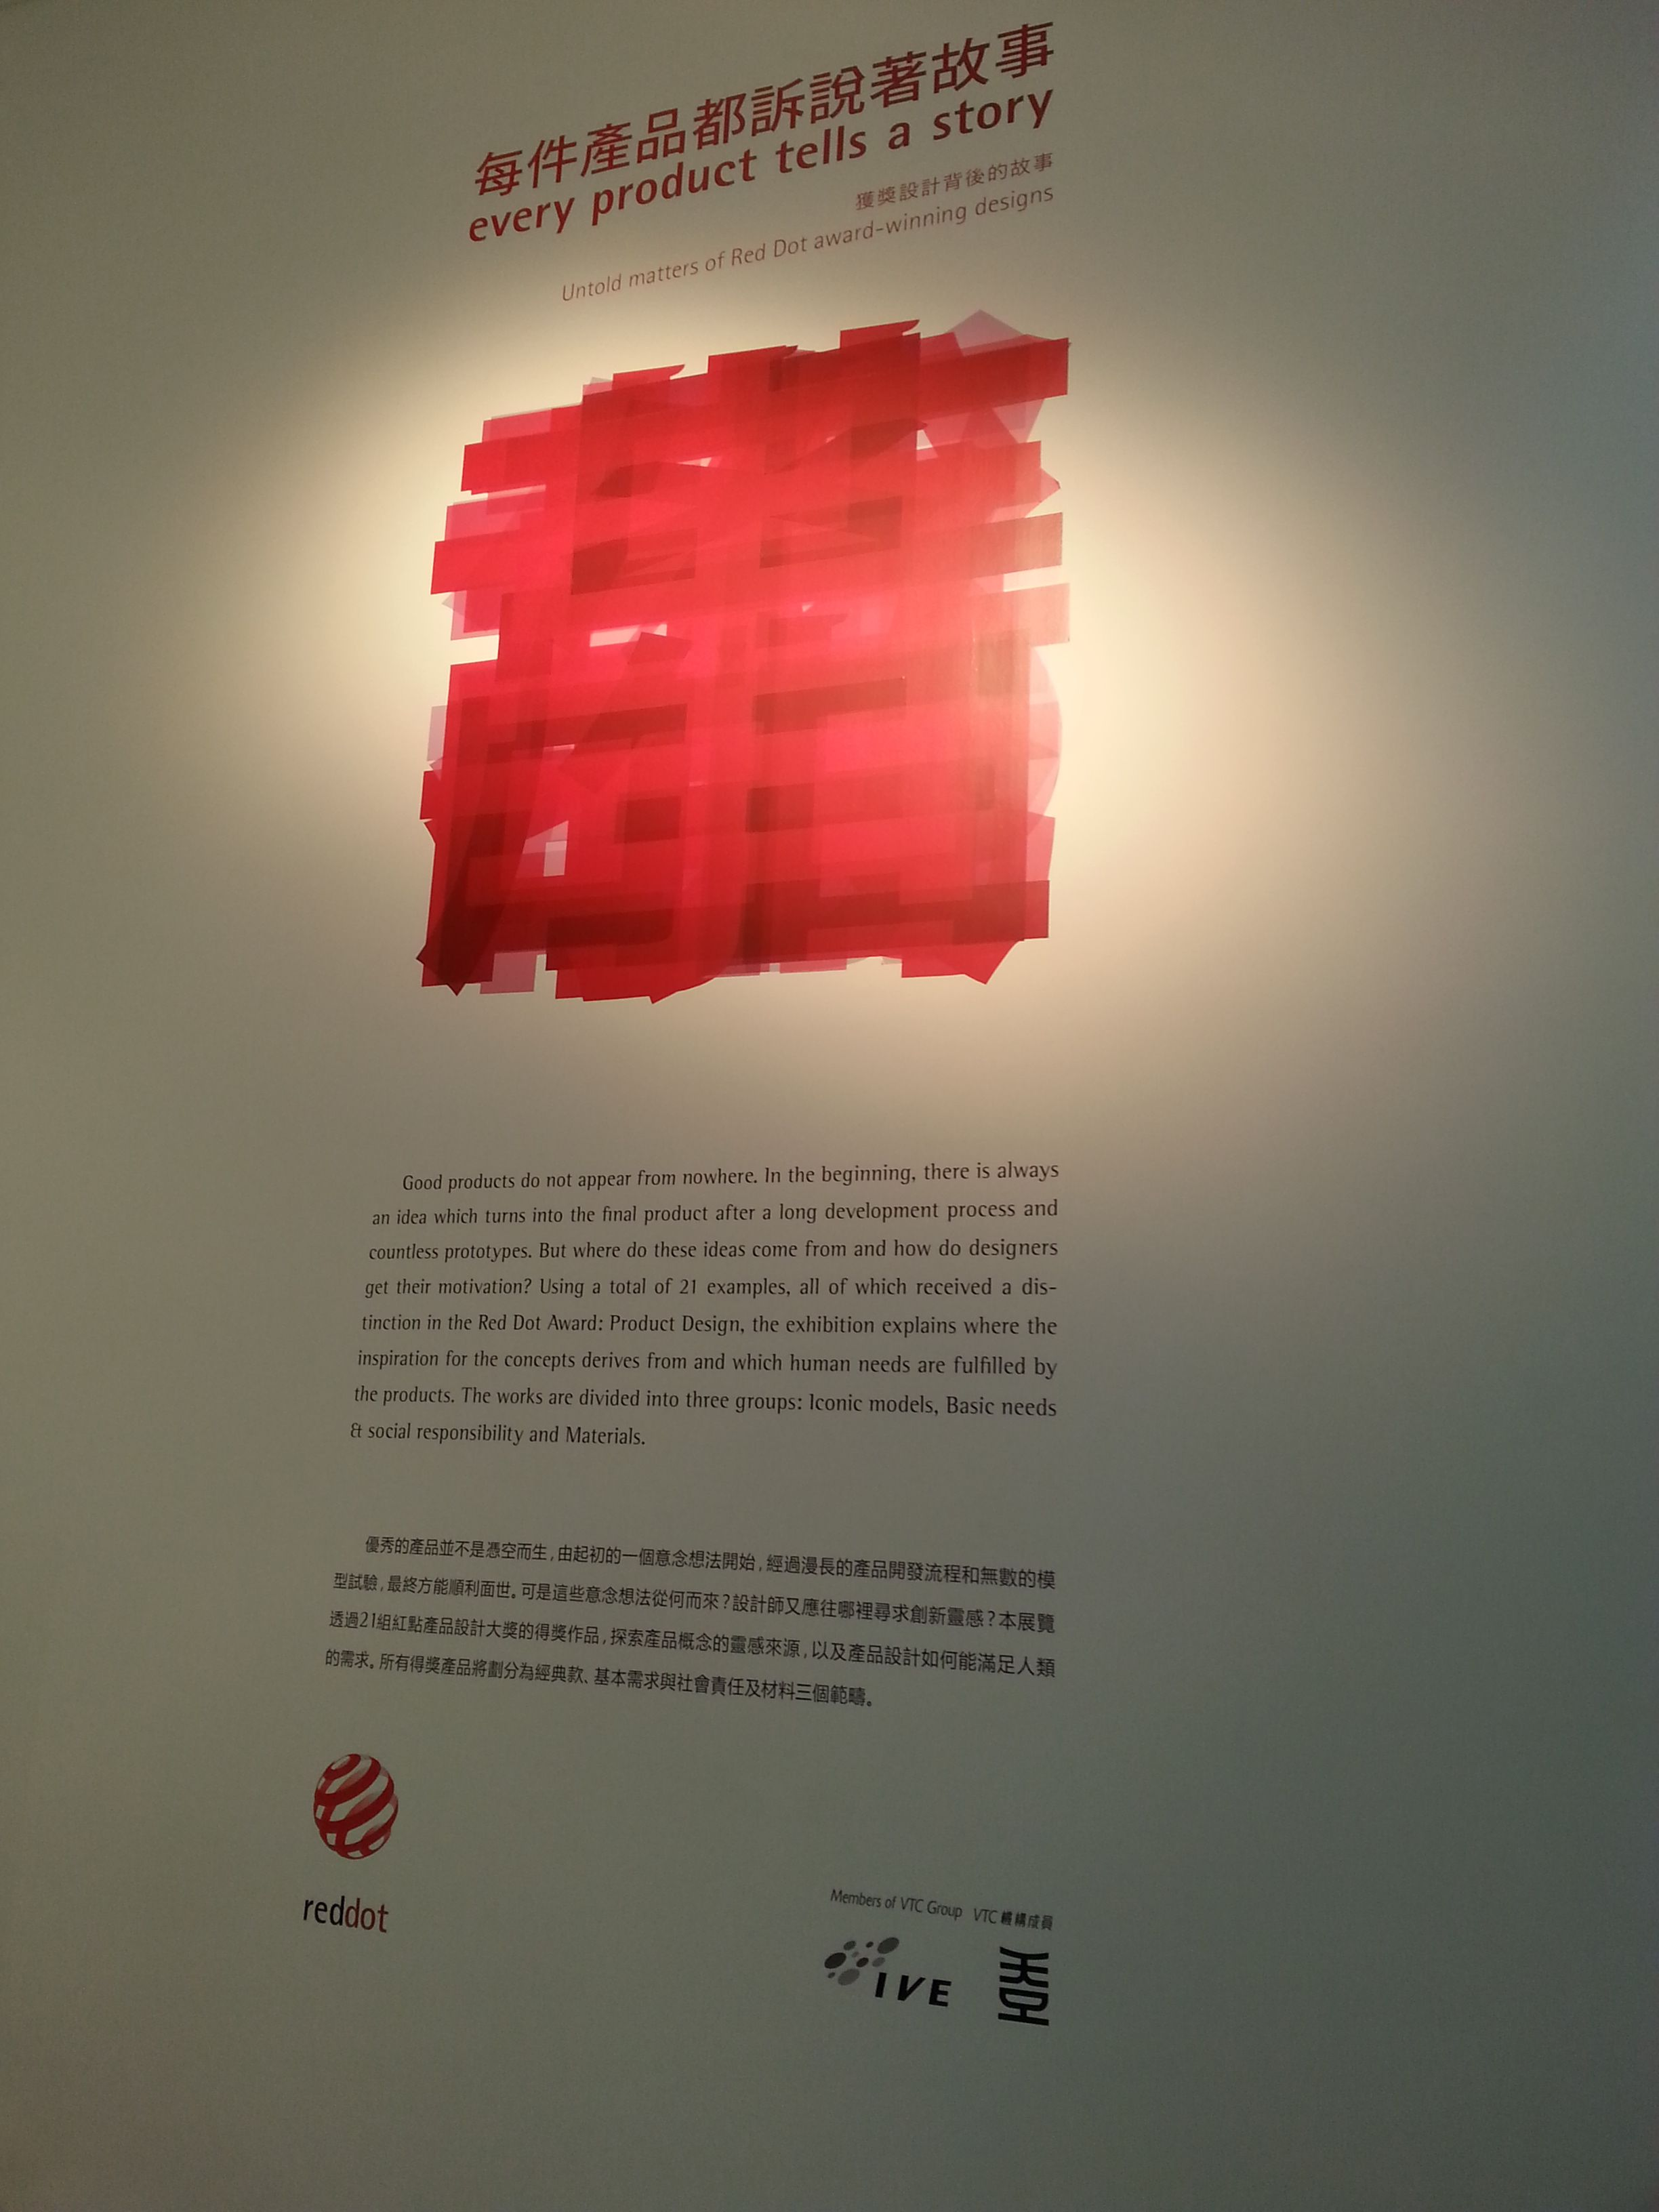 Untold Matters Of Red Dot Award Winning Designs Design Red Dots Motivation